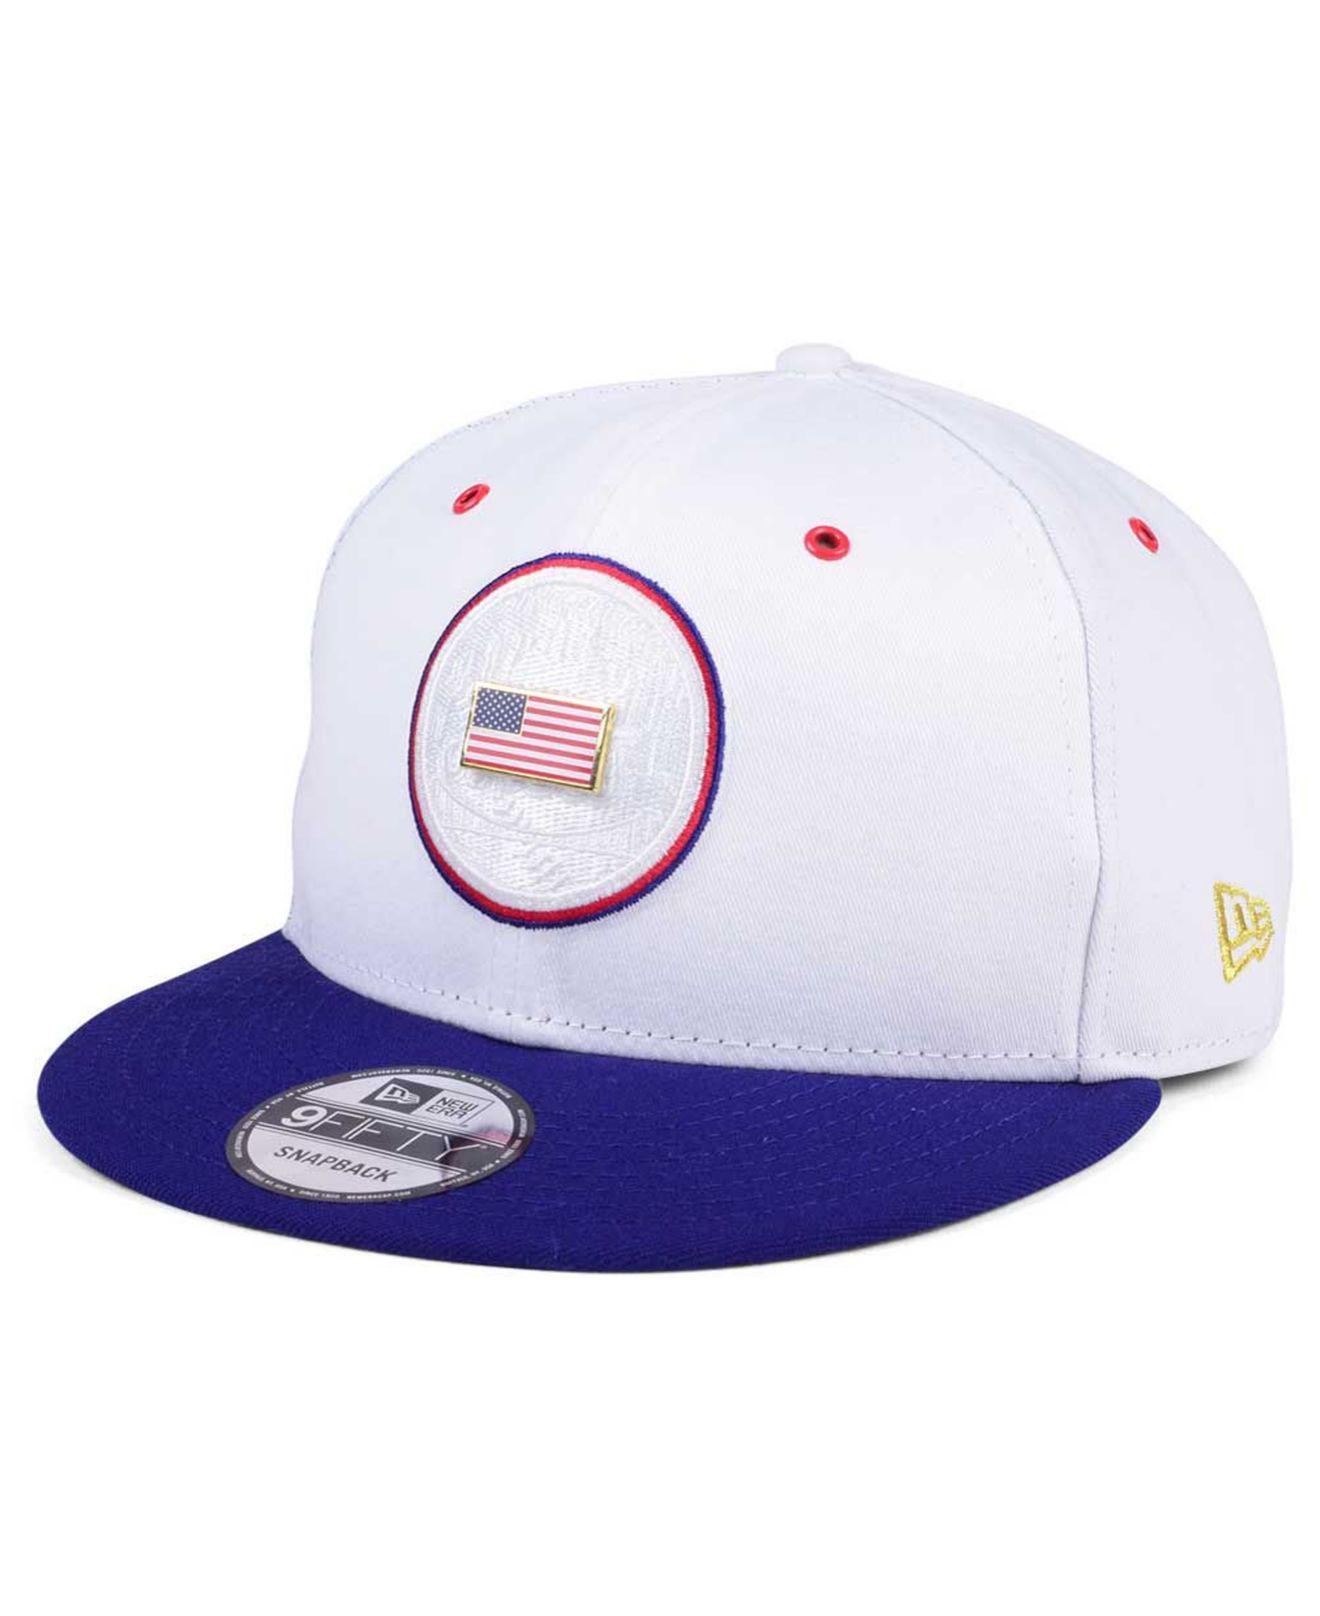 catch 736f0 412c2 lyst ktz new york giants camo 9fifty snapback cap ... def37b3a1